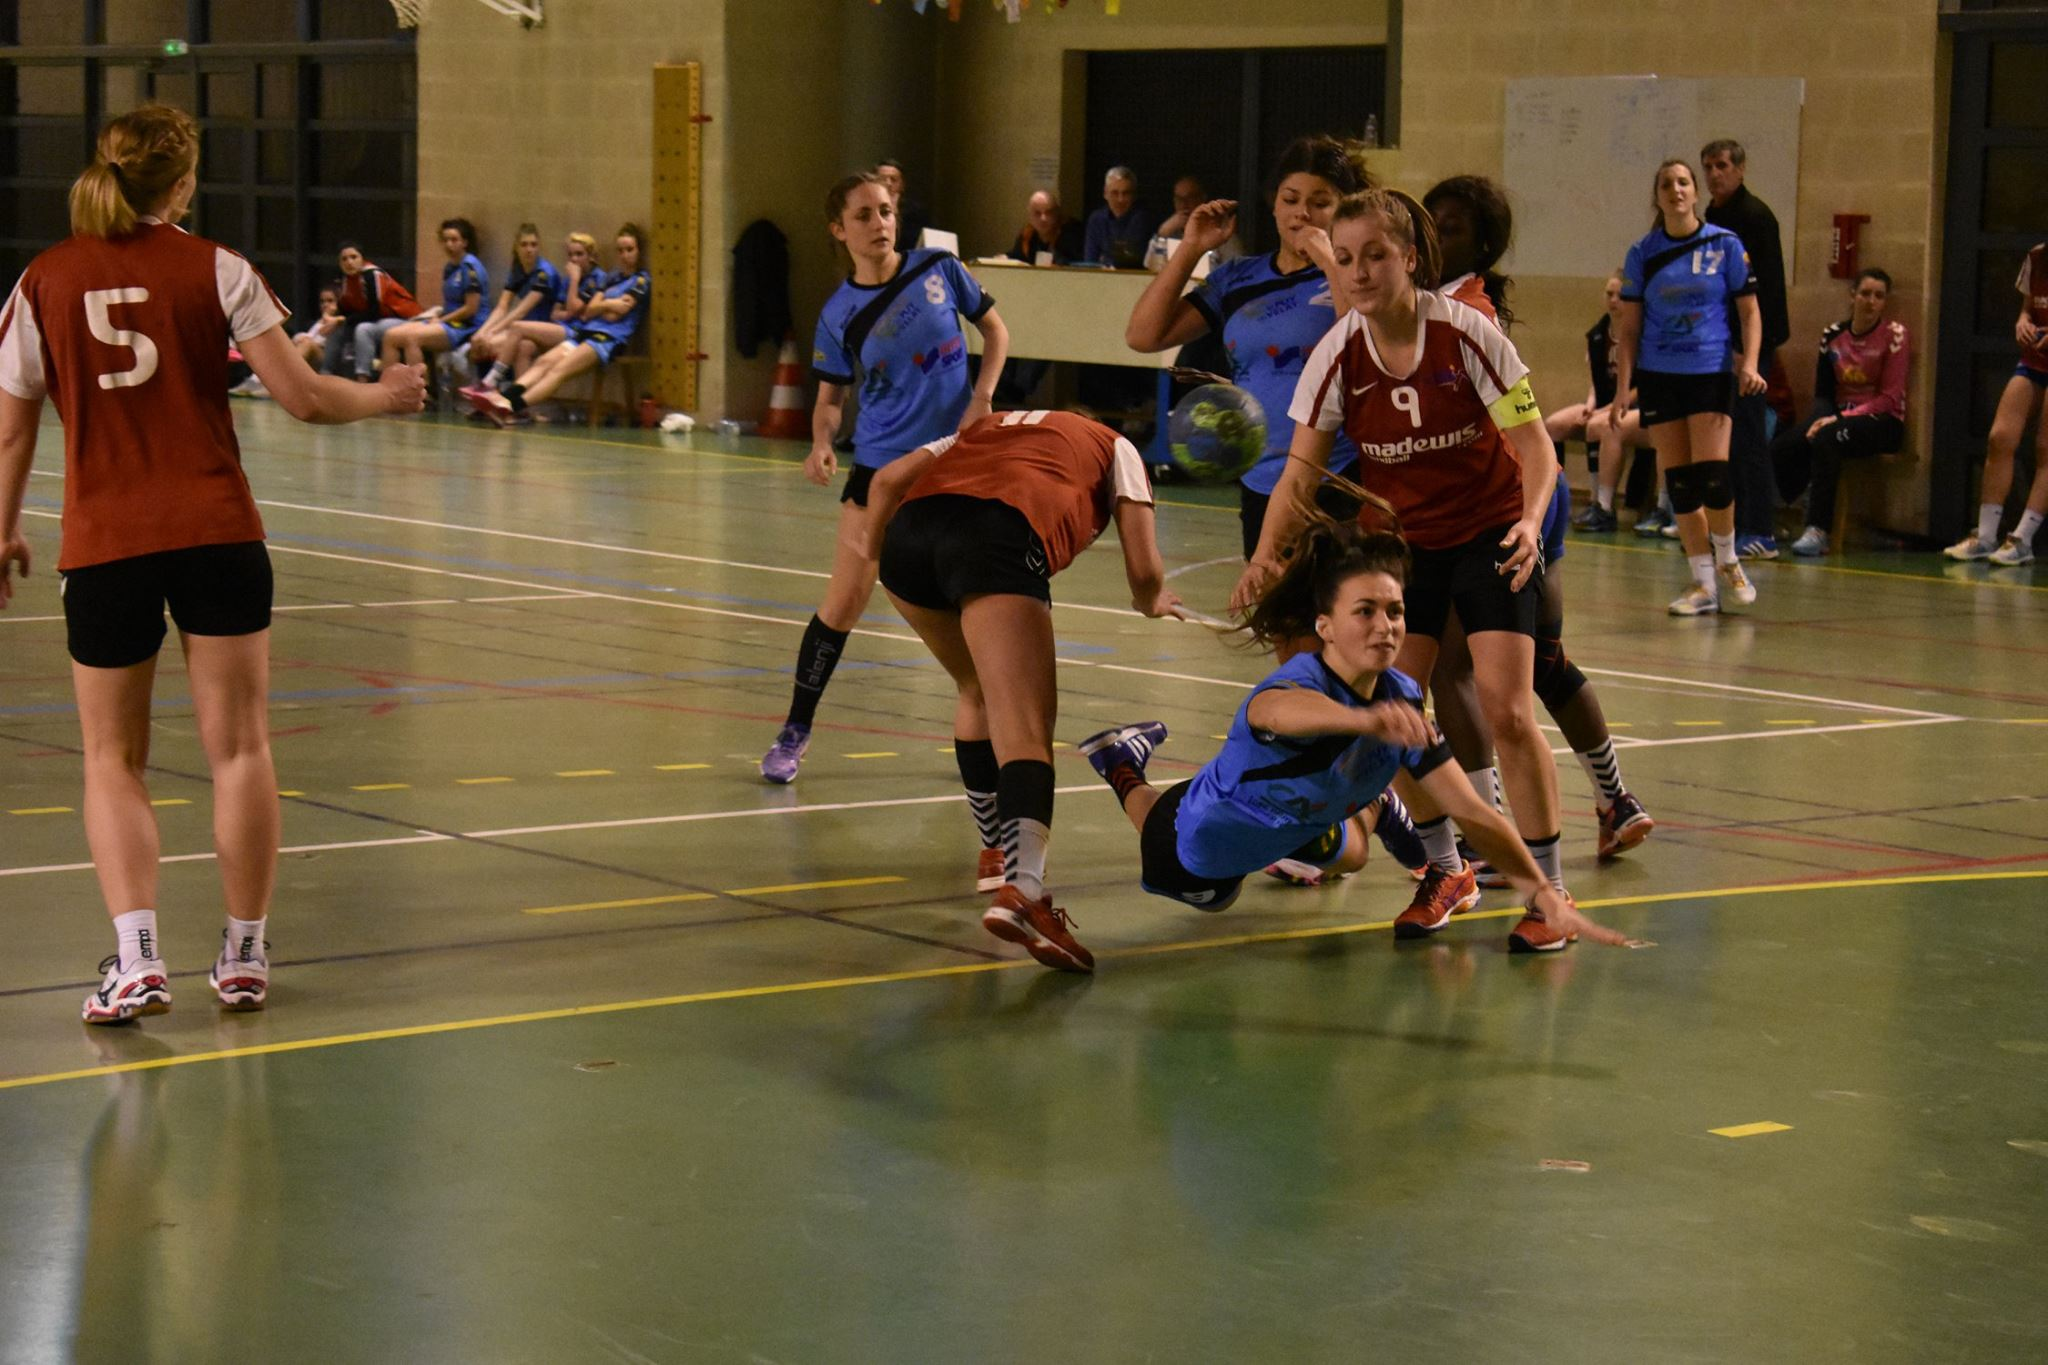 nationale 3 féminine handball st Saint-Chamond- st germain blavozy 11/02/17 19h